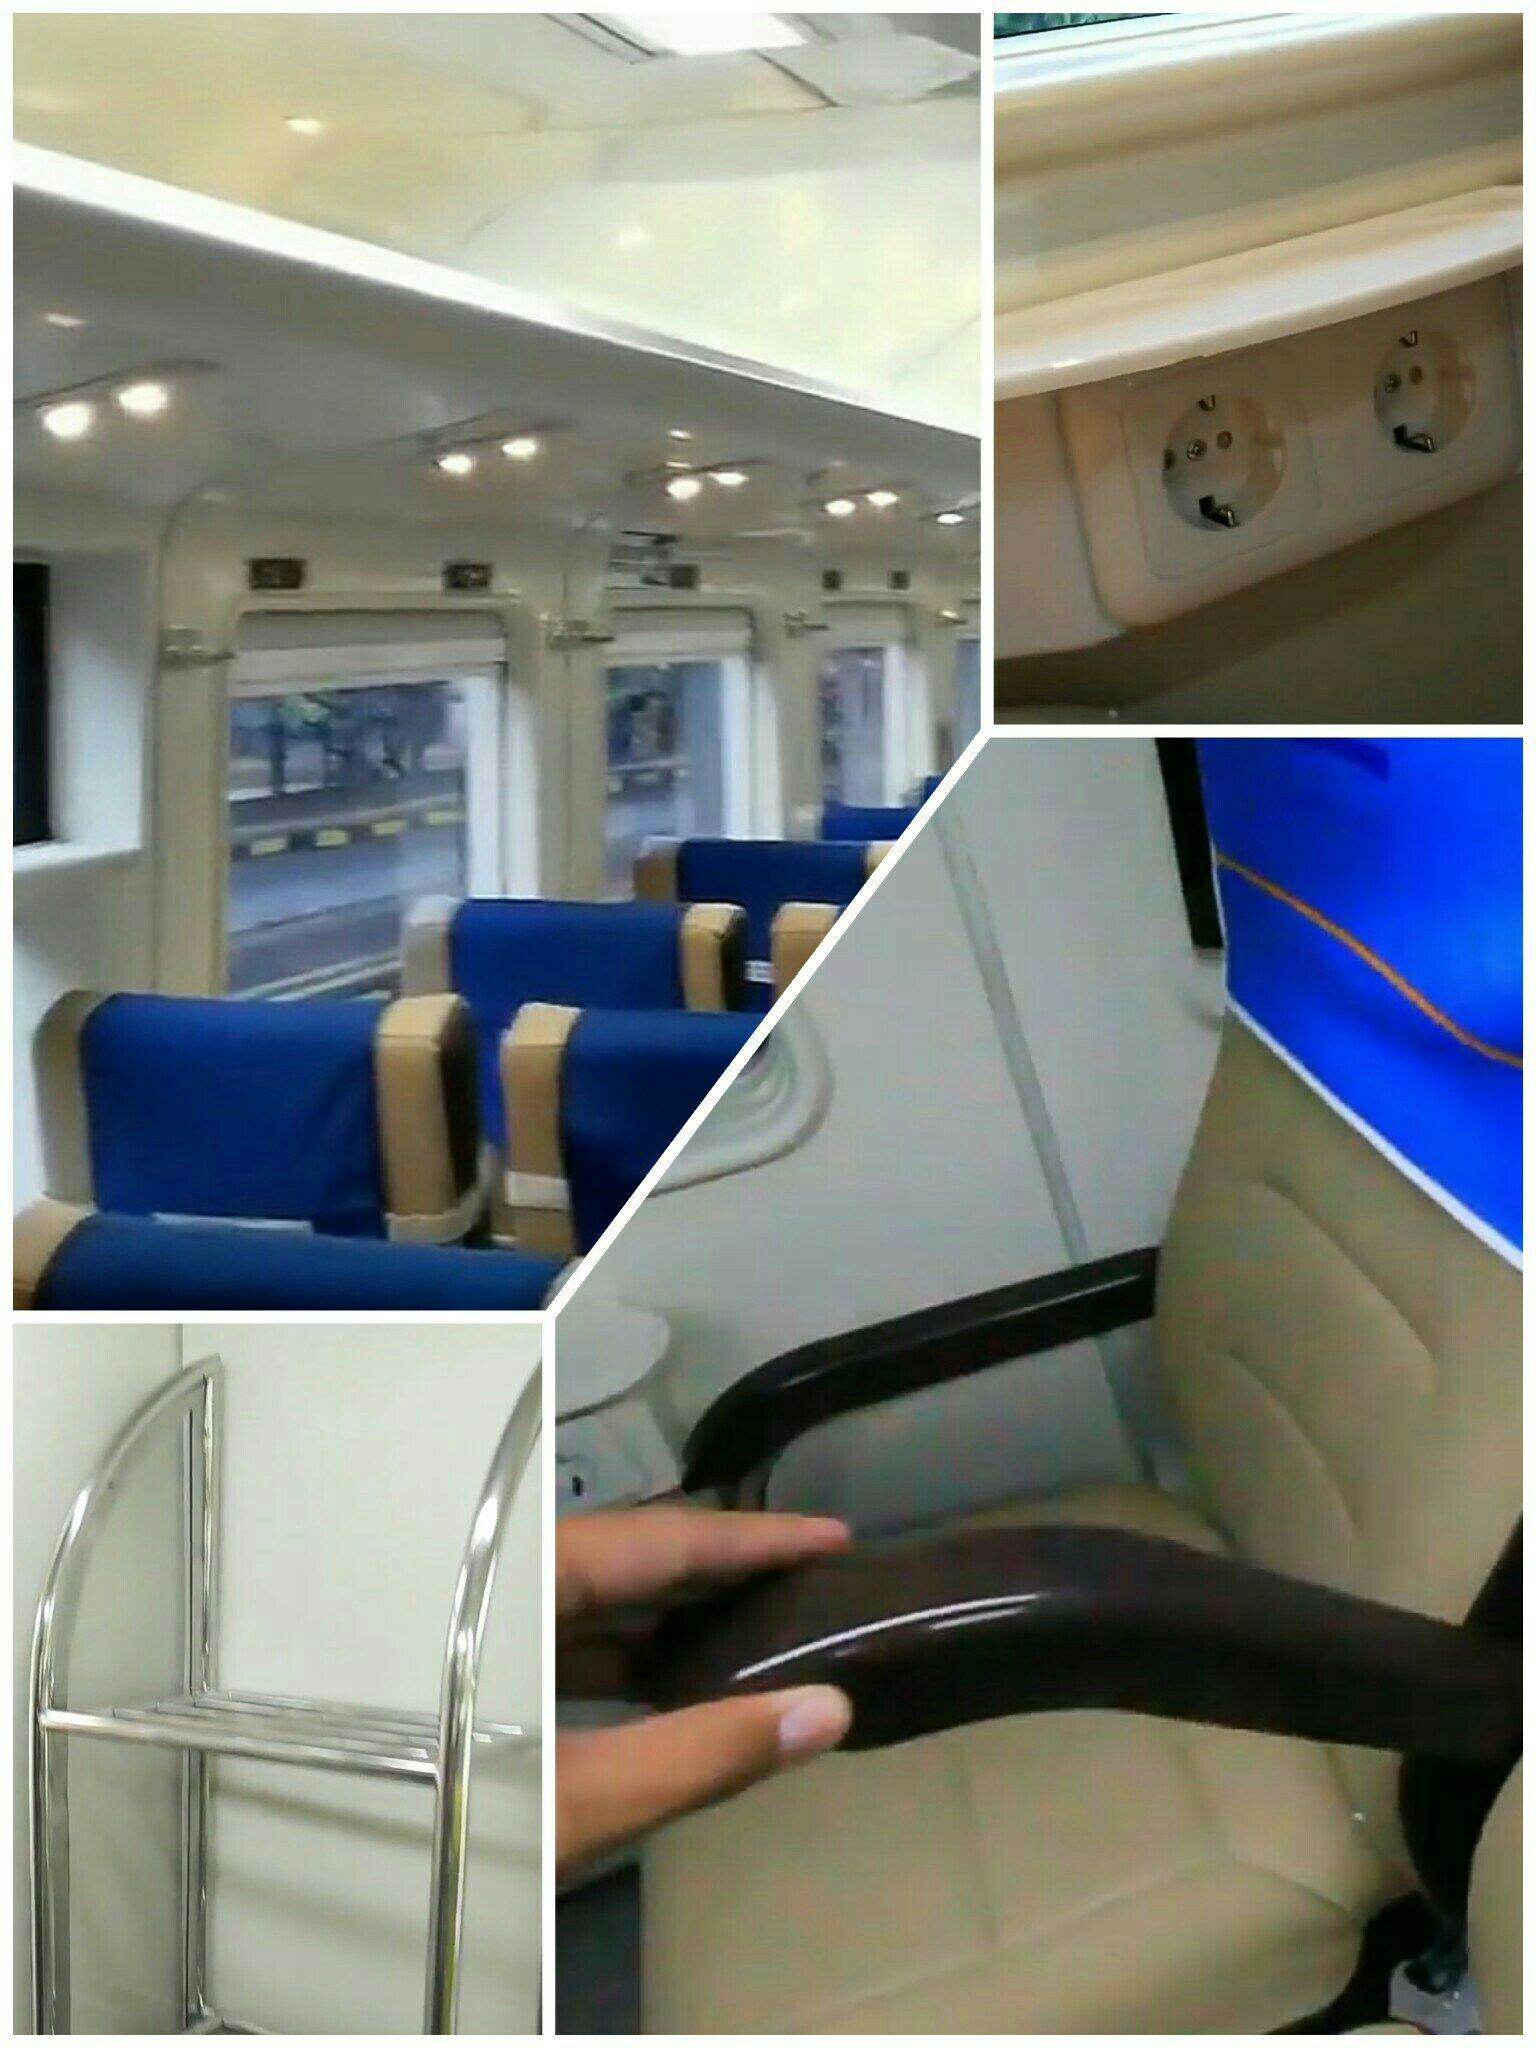 armrest yang dapat di lipat tv dan bagi para penumpang yang membawa koper besar dapat menaruh kopernya di belakang kursi nomor 18 karena dibelakang